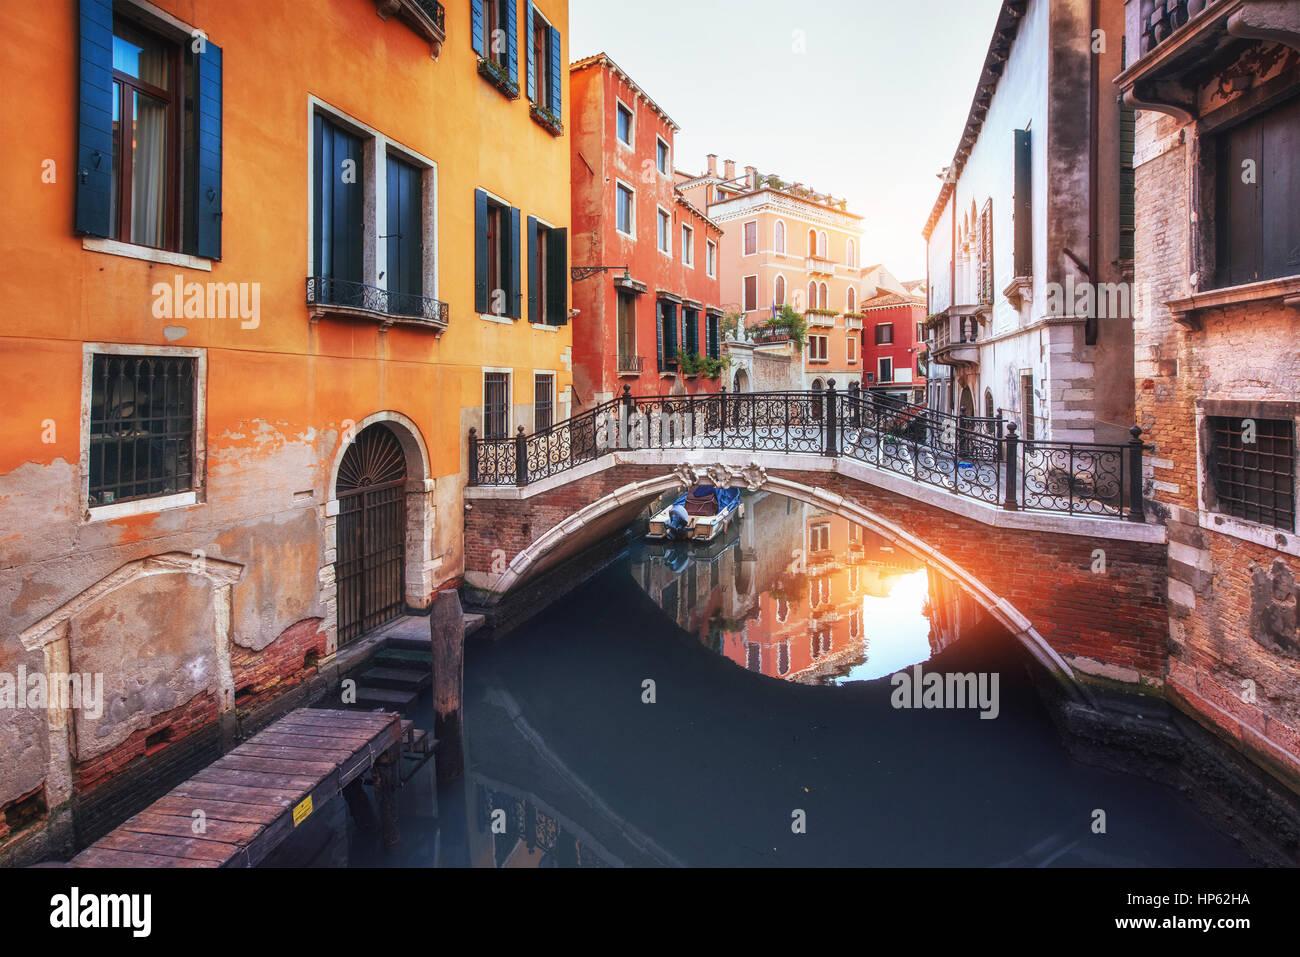 Gondolas on canal in Venice, Italy - Stock Image